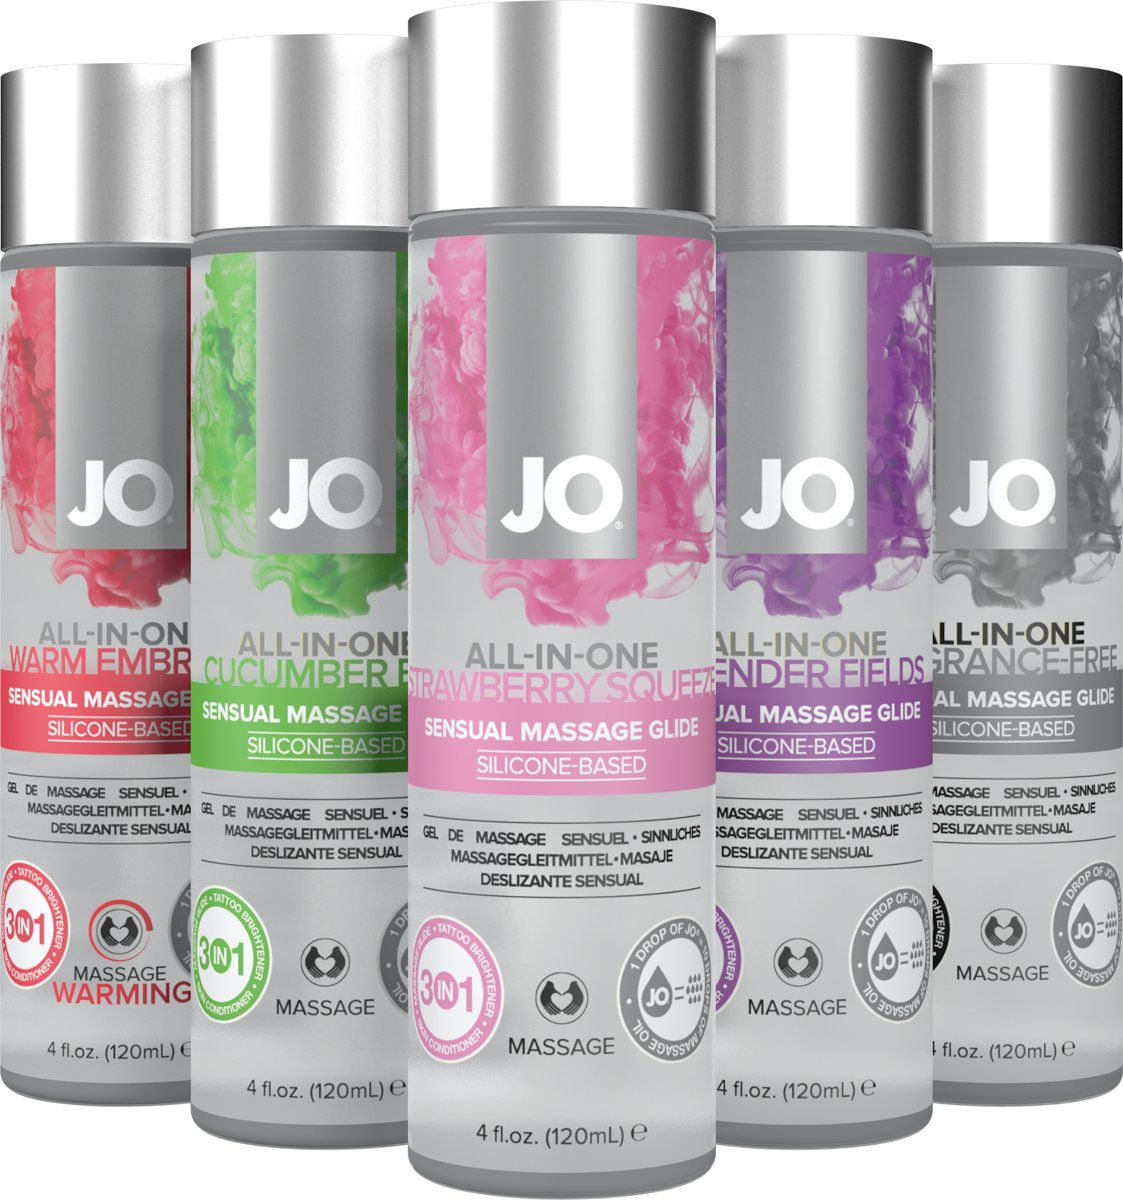 Ml Senual Glide Jo Lavendel 120 System All-in One Massage-25088